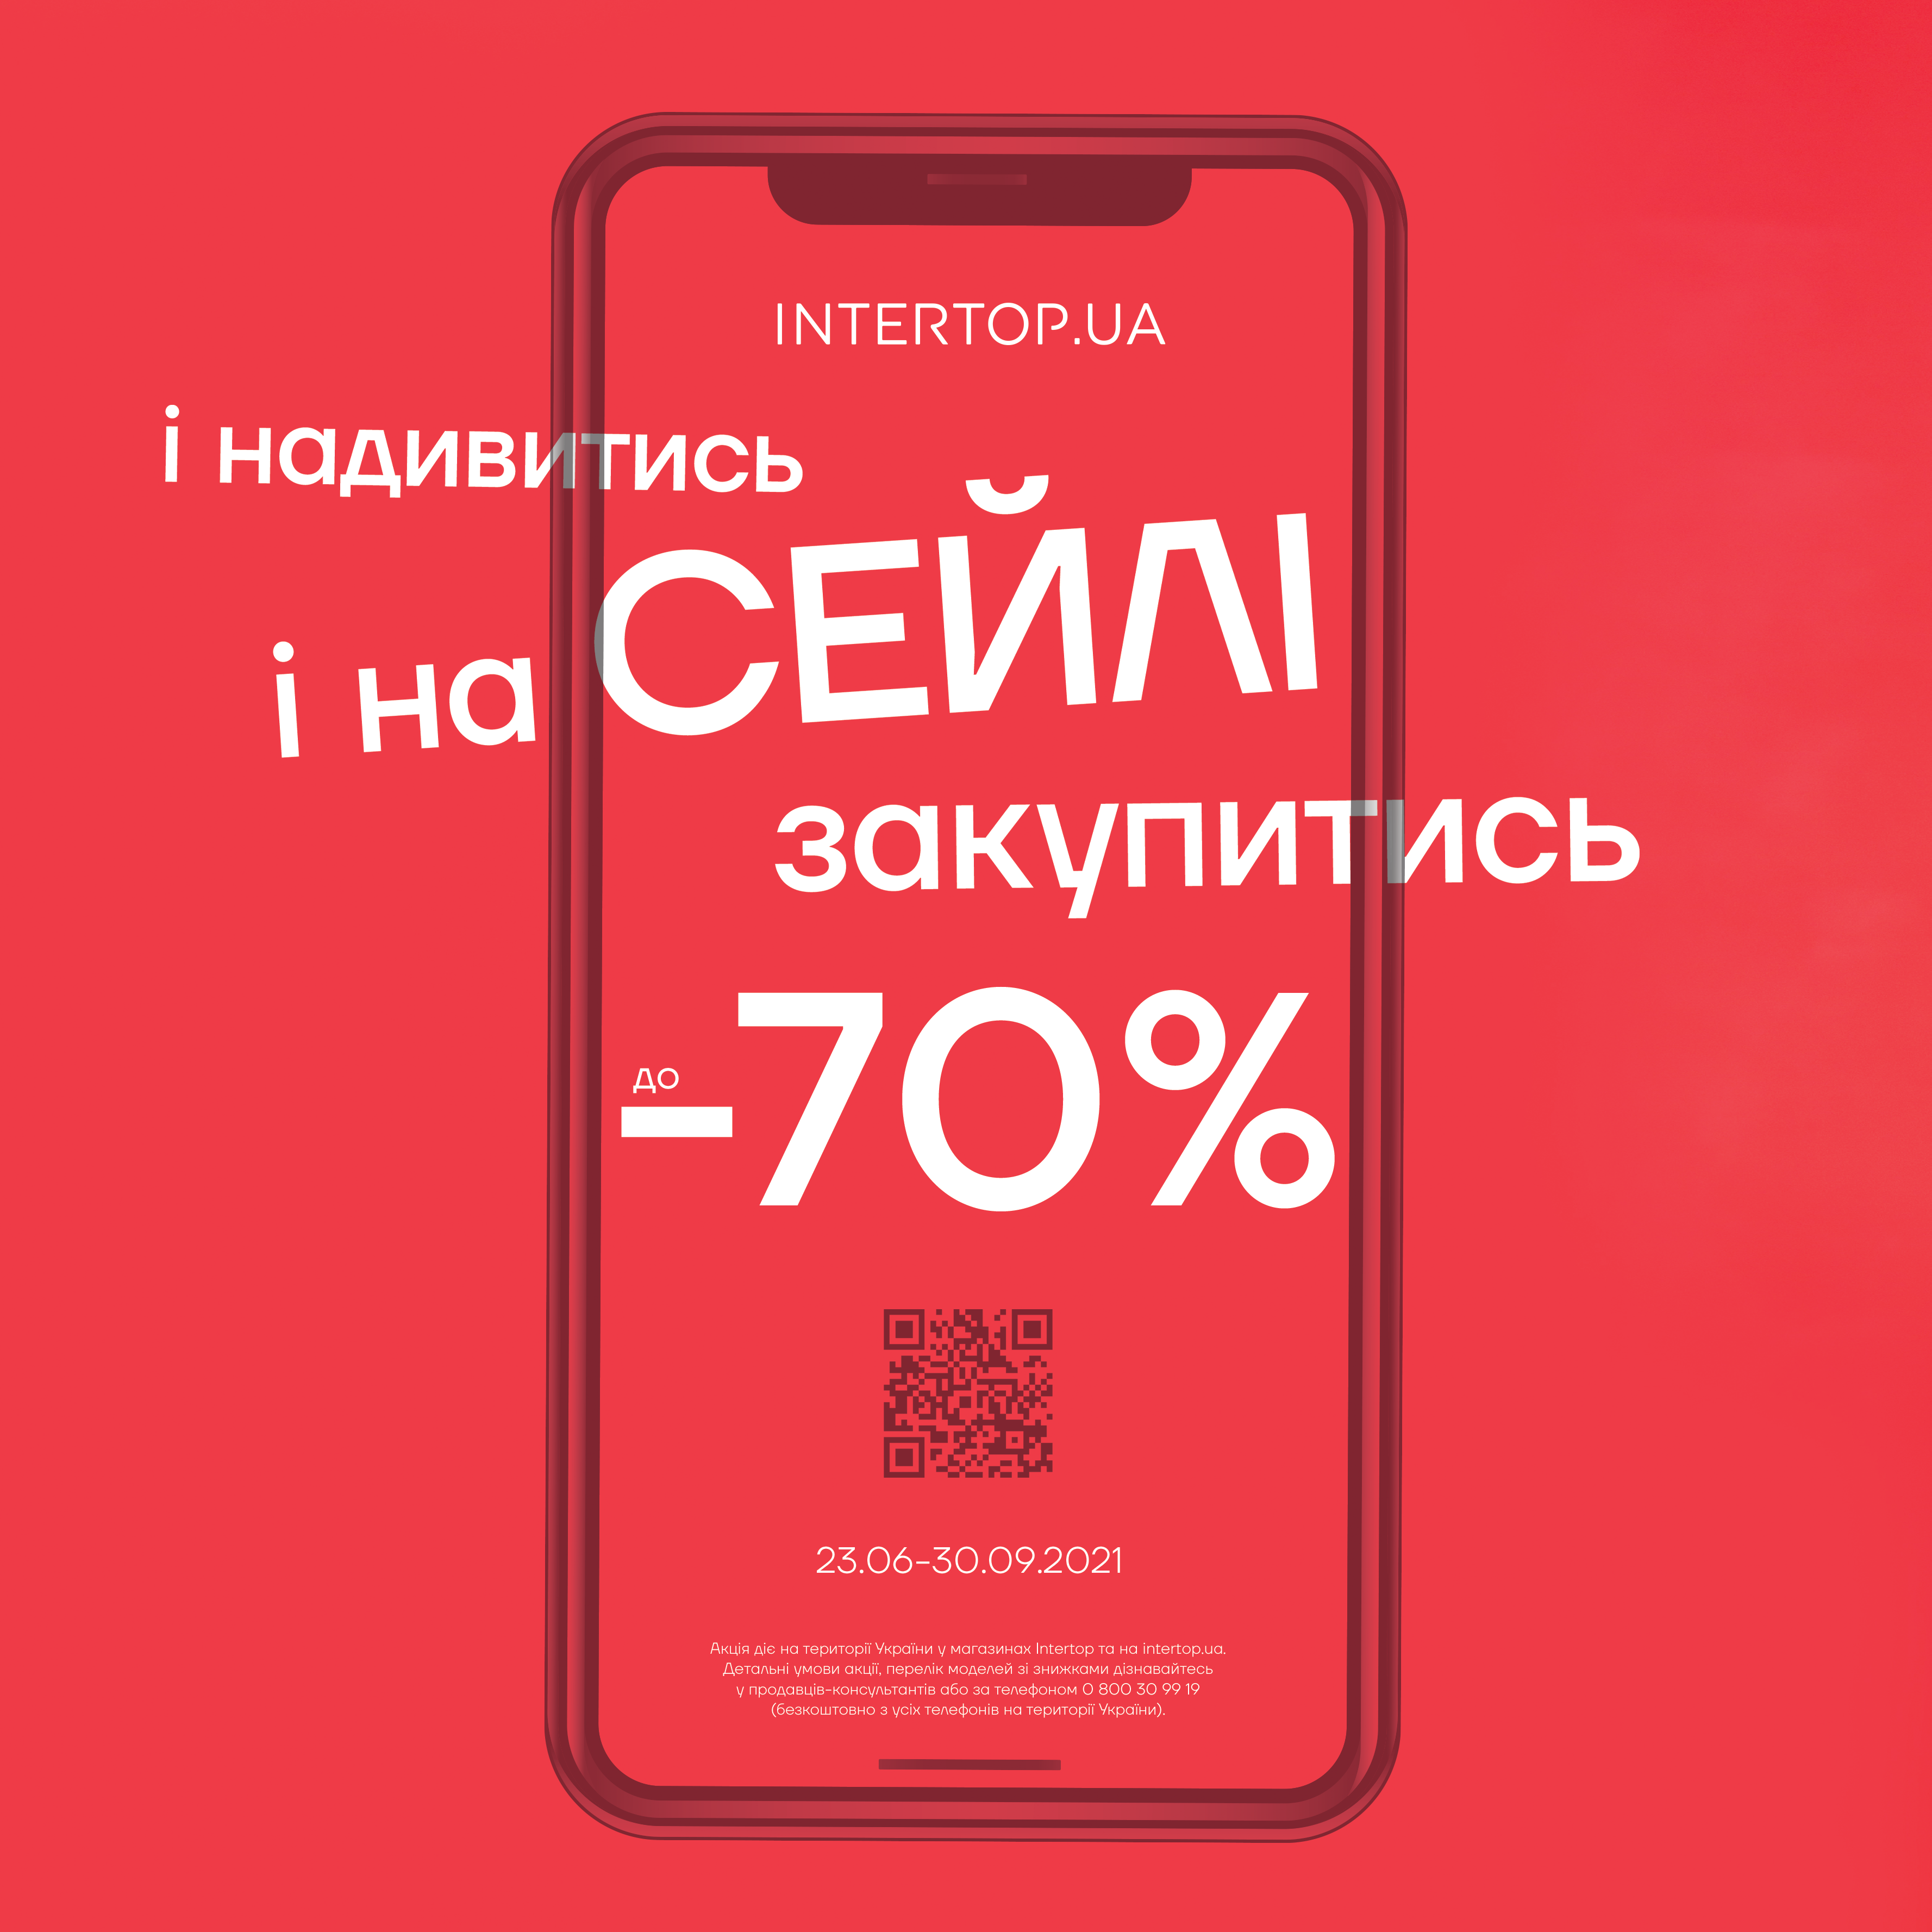 Знижки до -70% в магазинах INTERTOP!